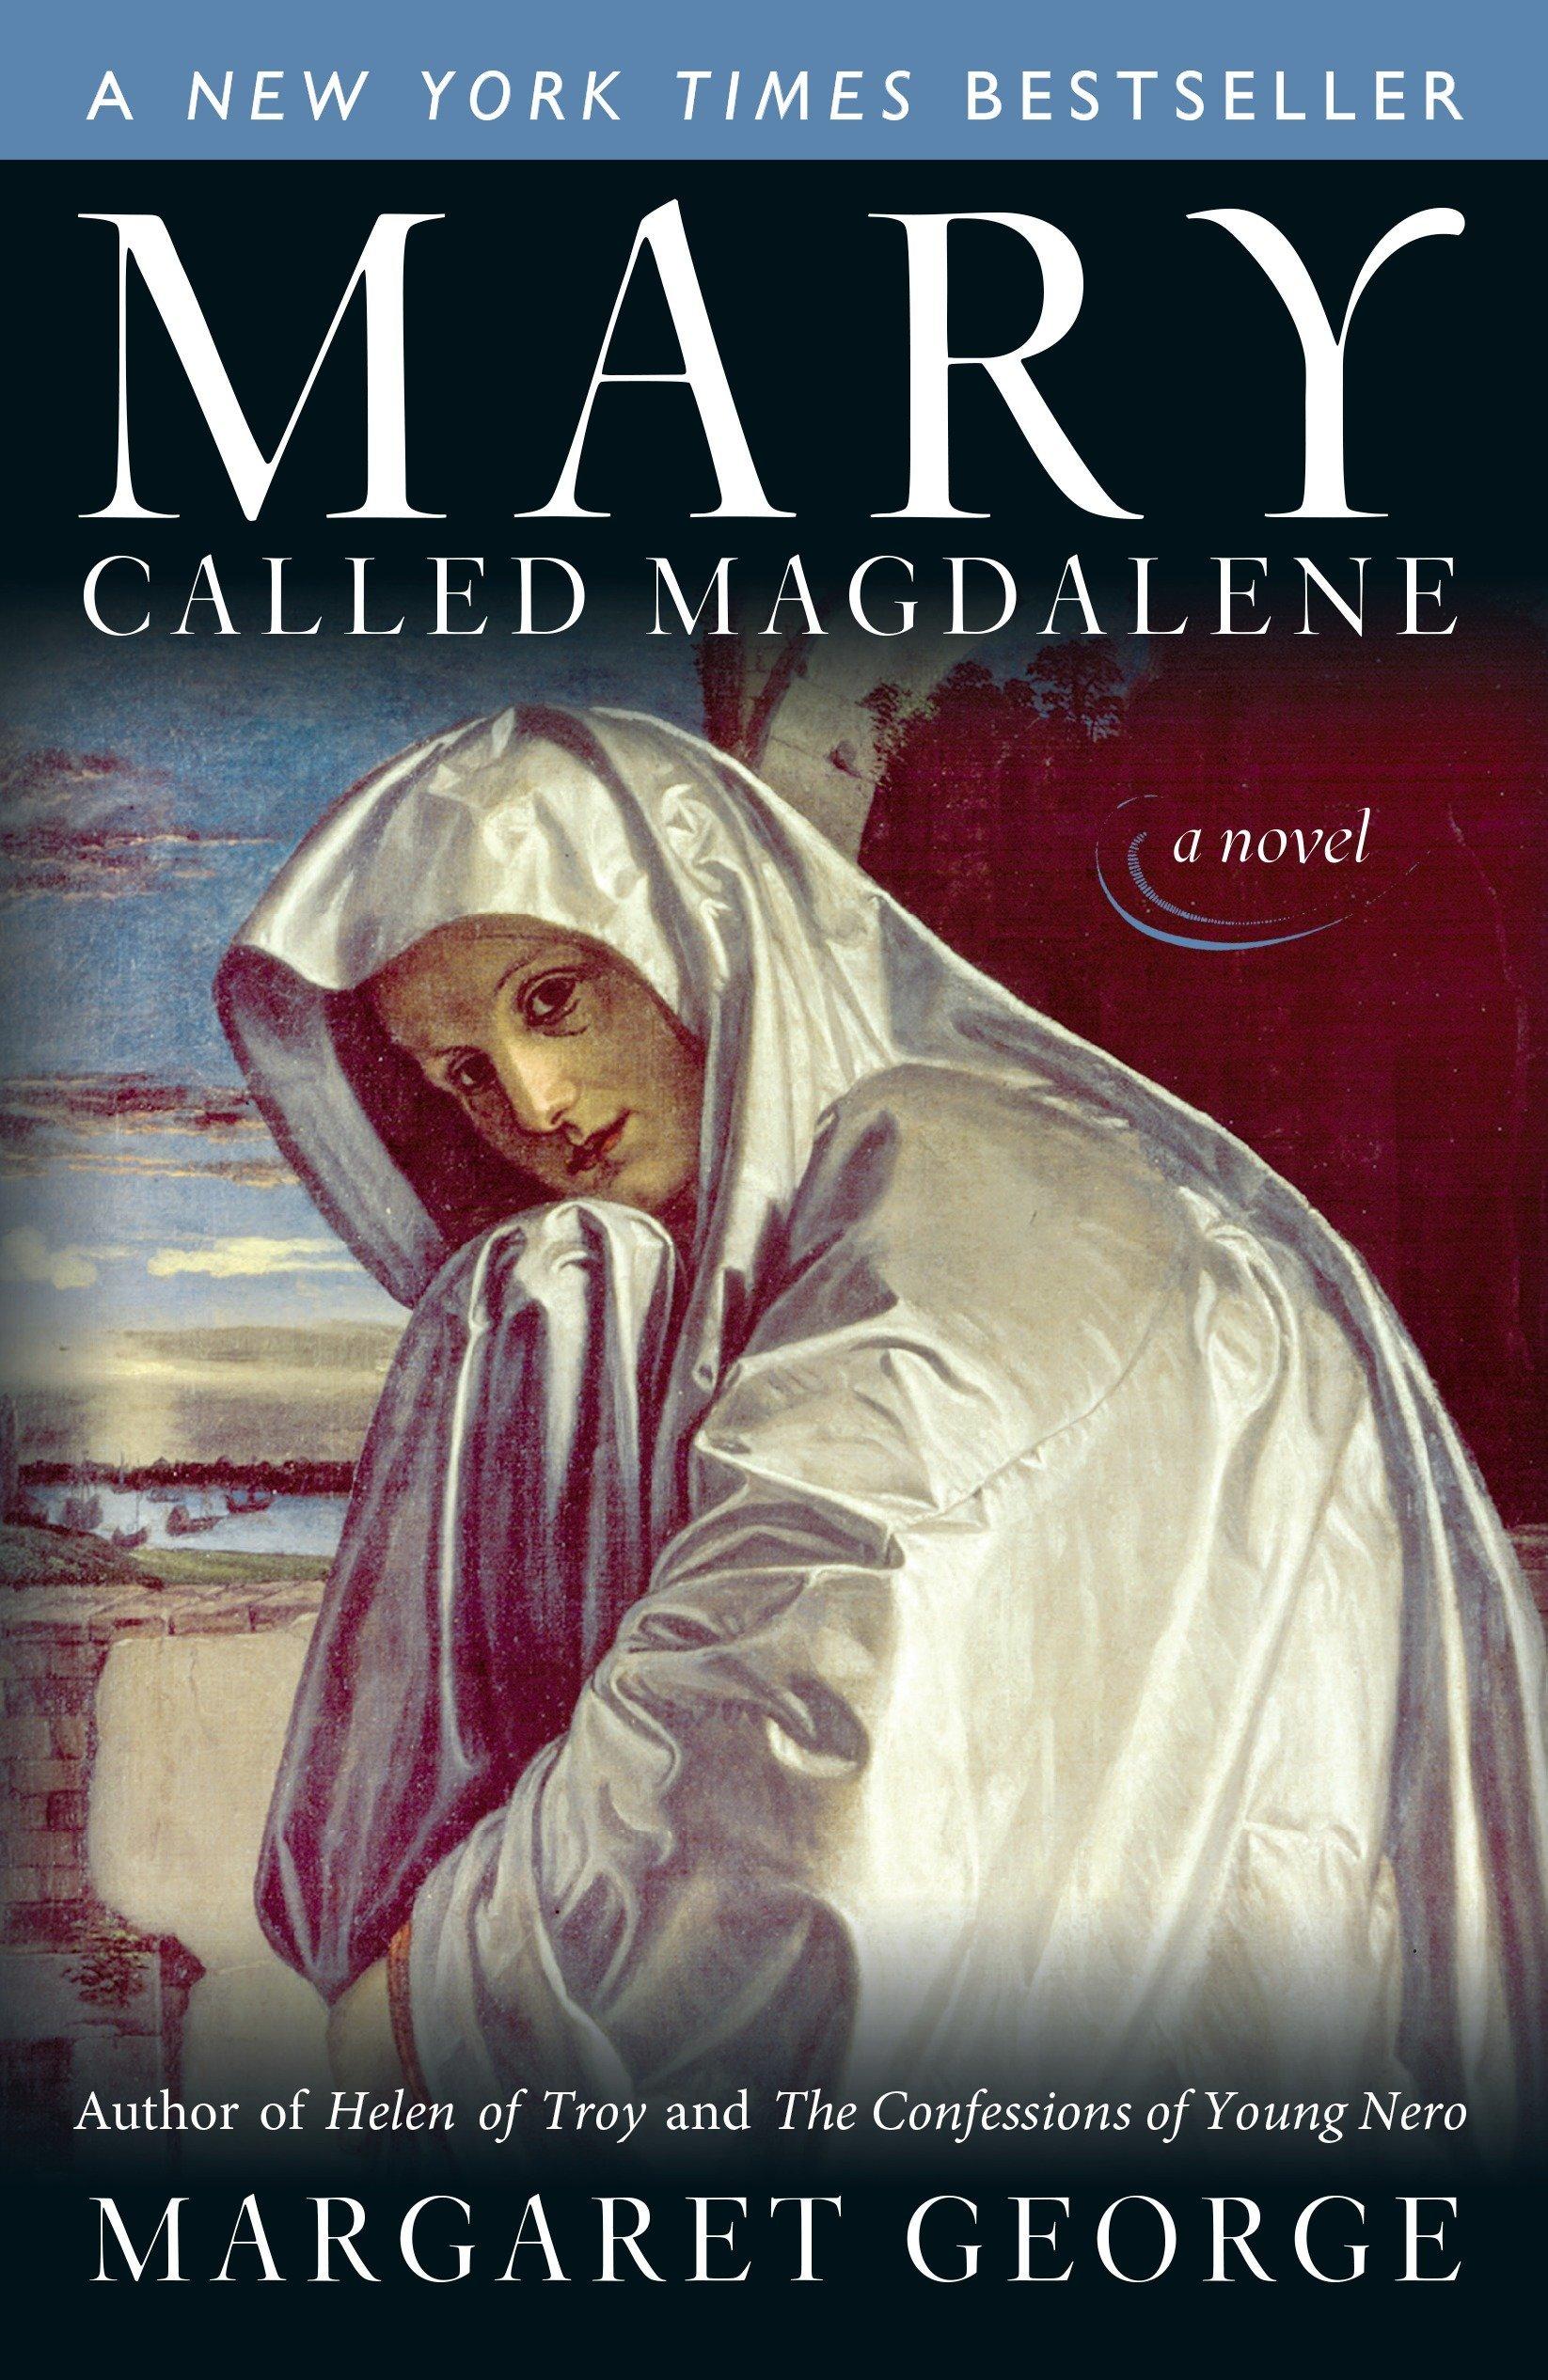 Amazon.com: Mary, Called Magdalene (9780142002797): Margaret George: Books